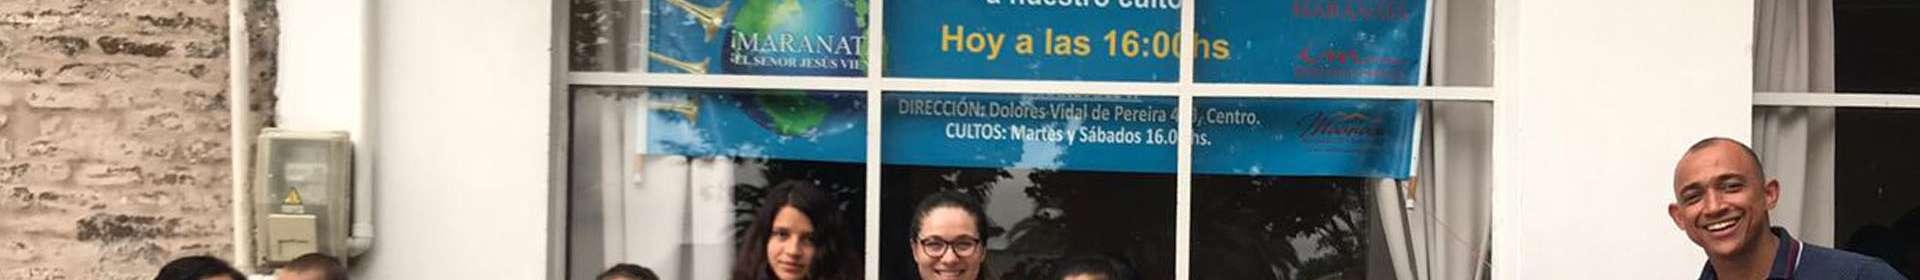 Voluntários da Igreja Cristã Maranata evangelizam no Uruguai